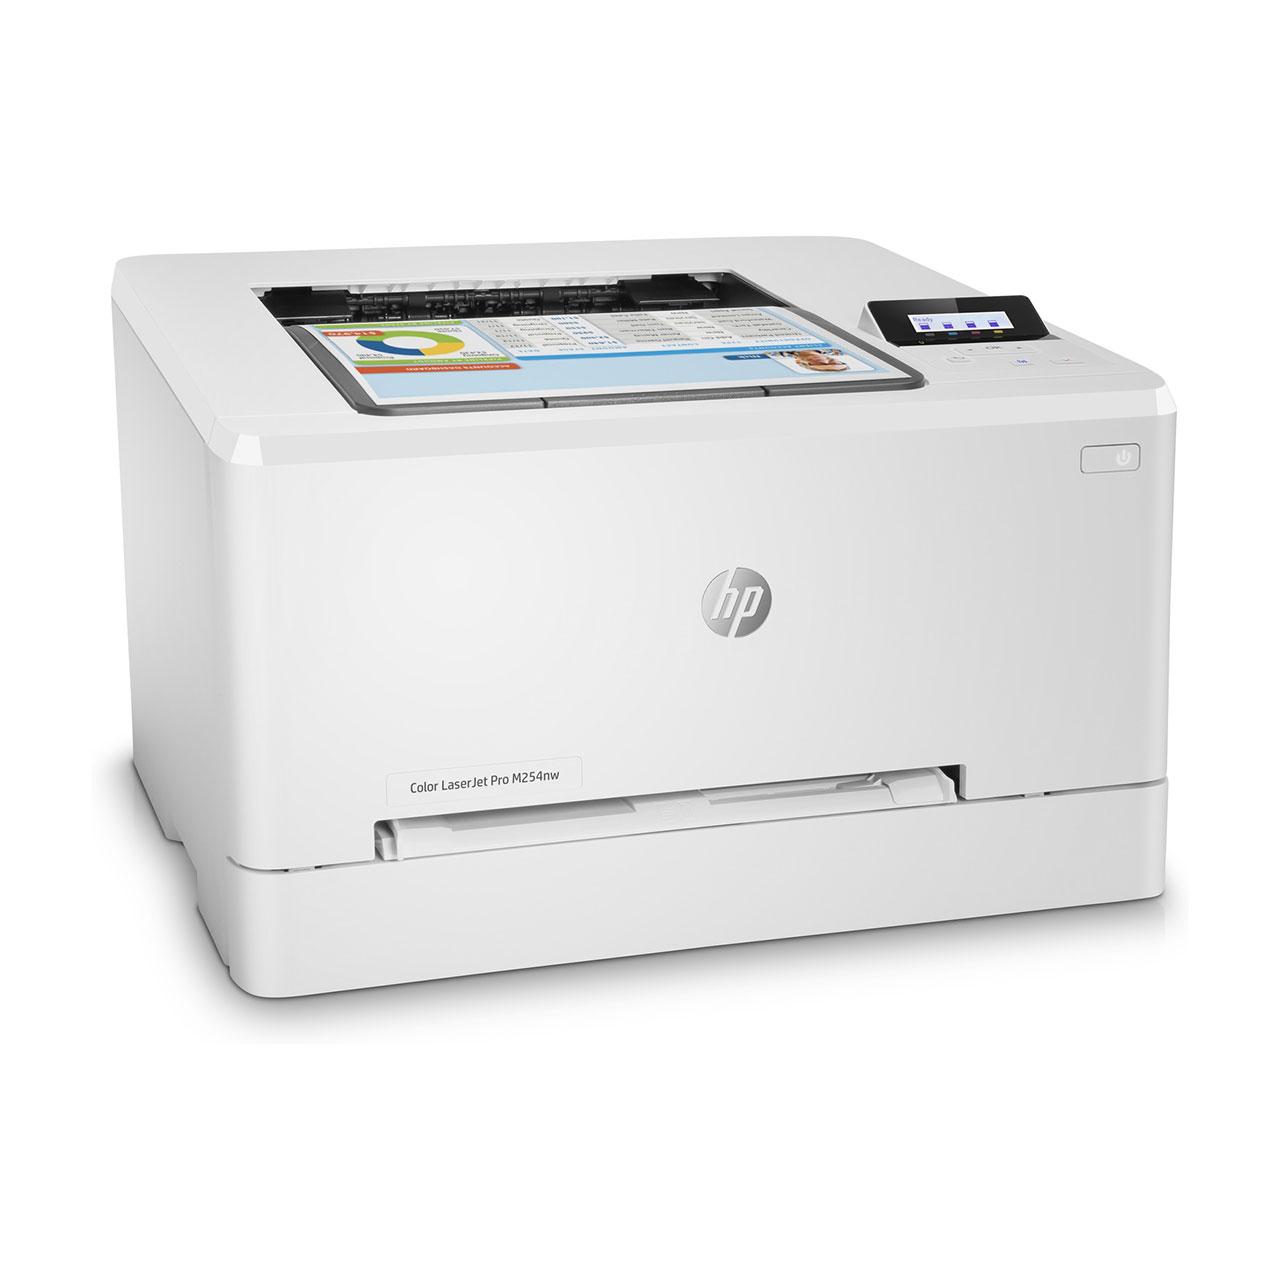 HP Color LaserJet Pro M254nw toner